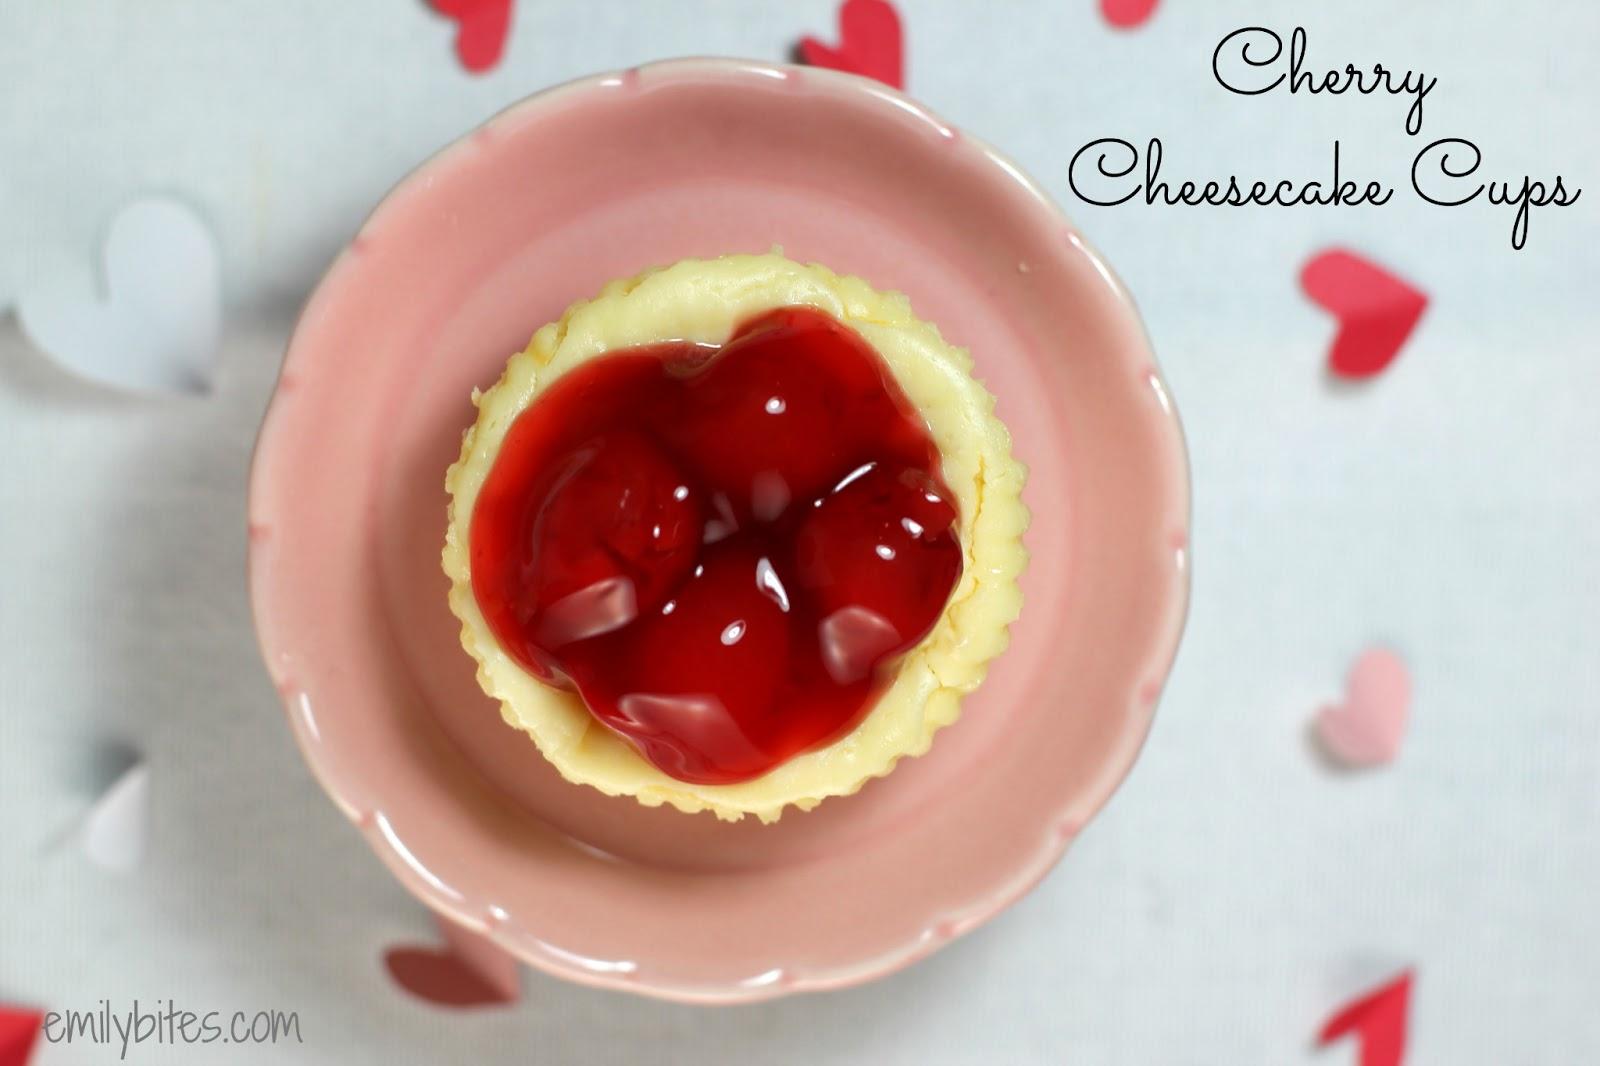 Cherry Cheesecake Cups - Emily Bites